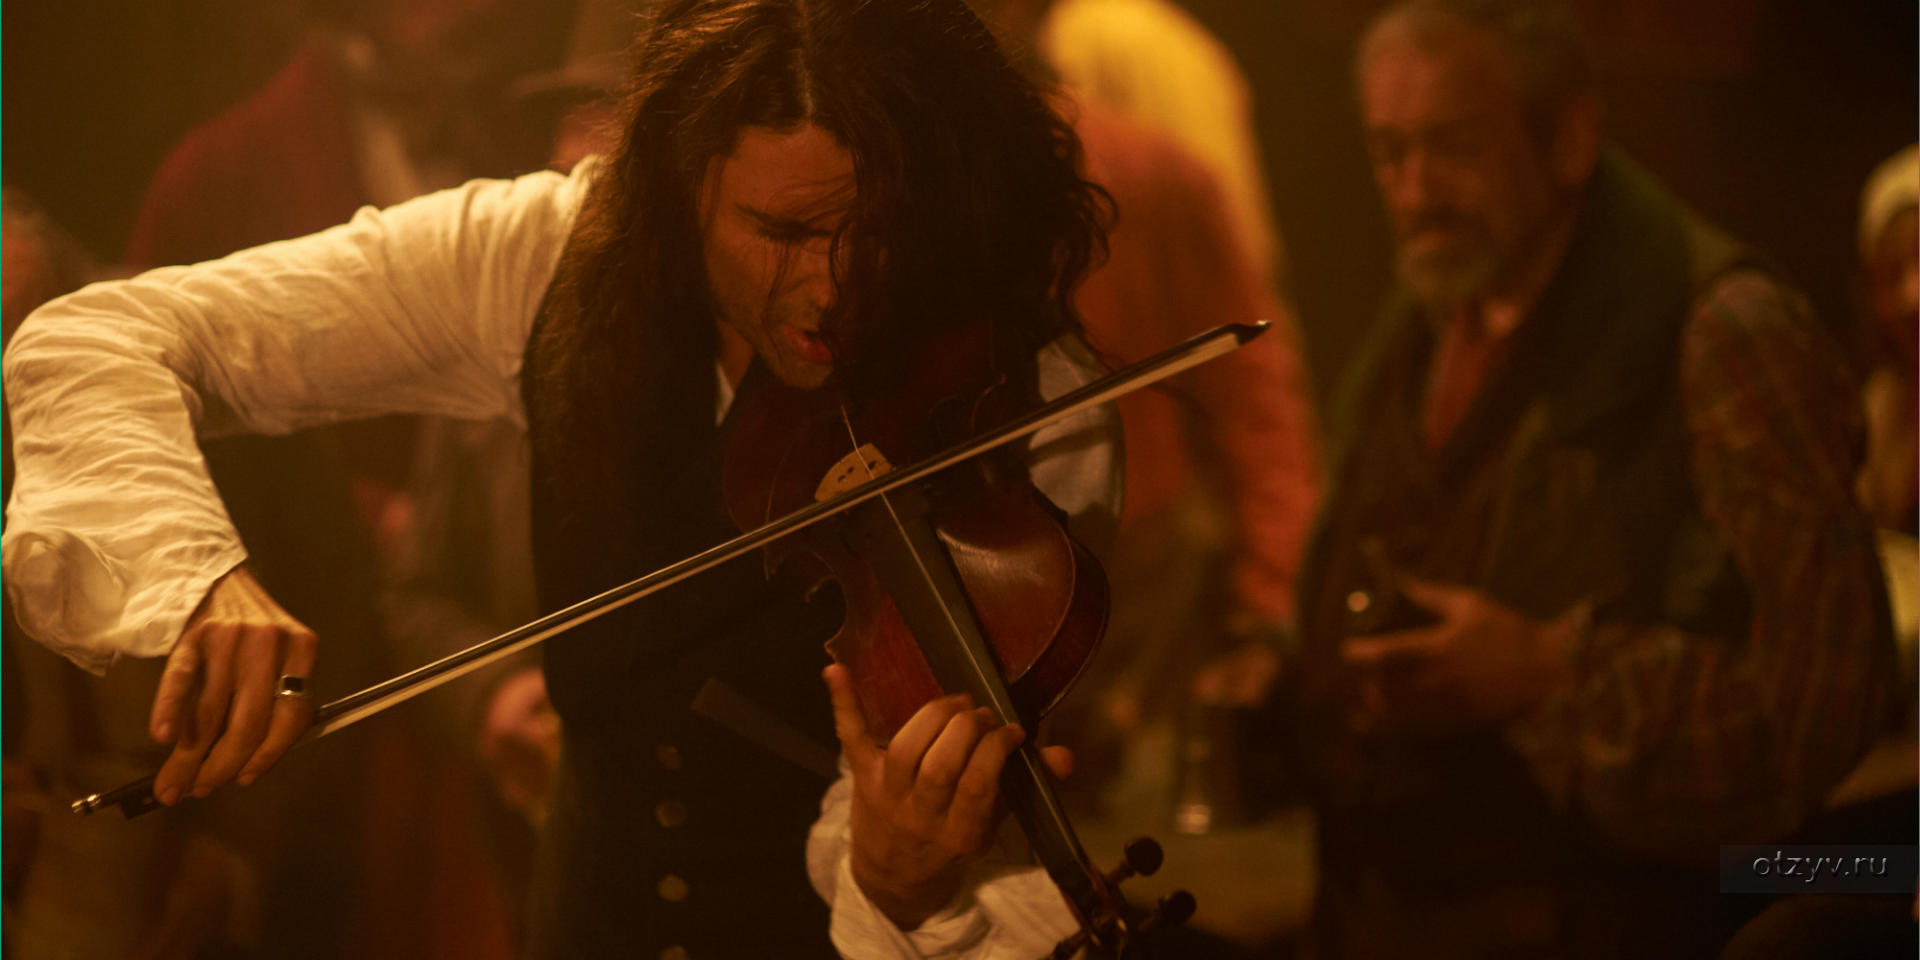 Паганини скрипач дьявола 2013 the devils violinist -